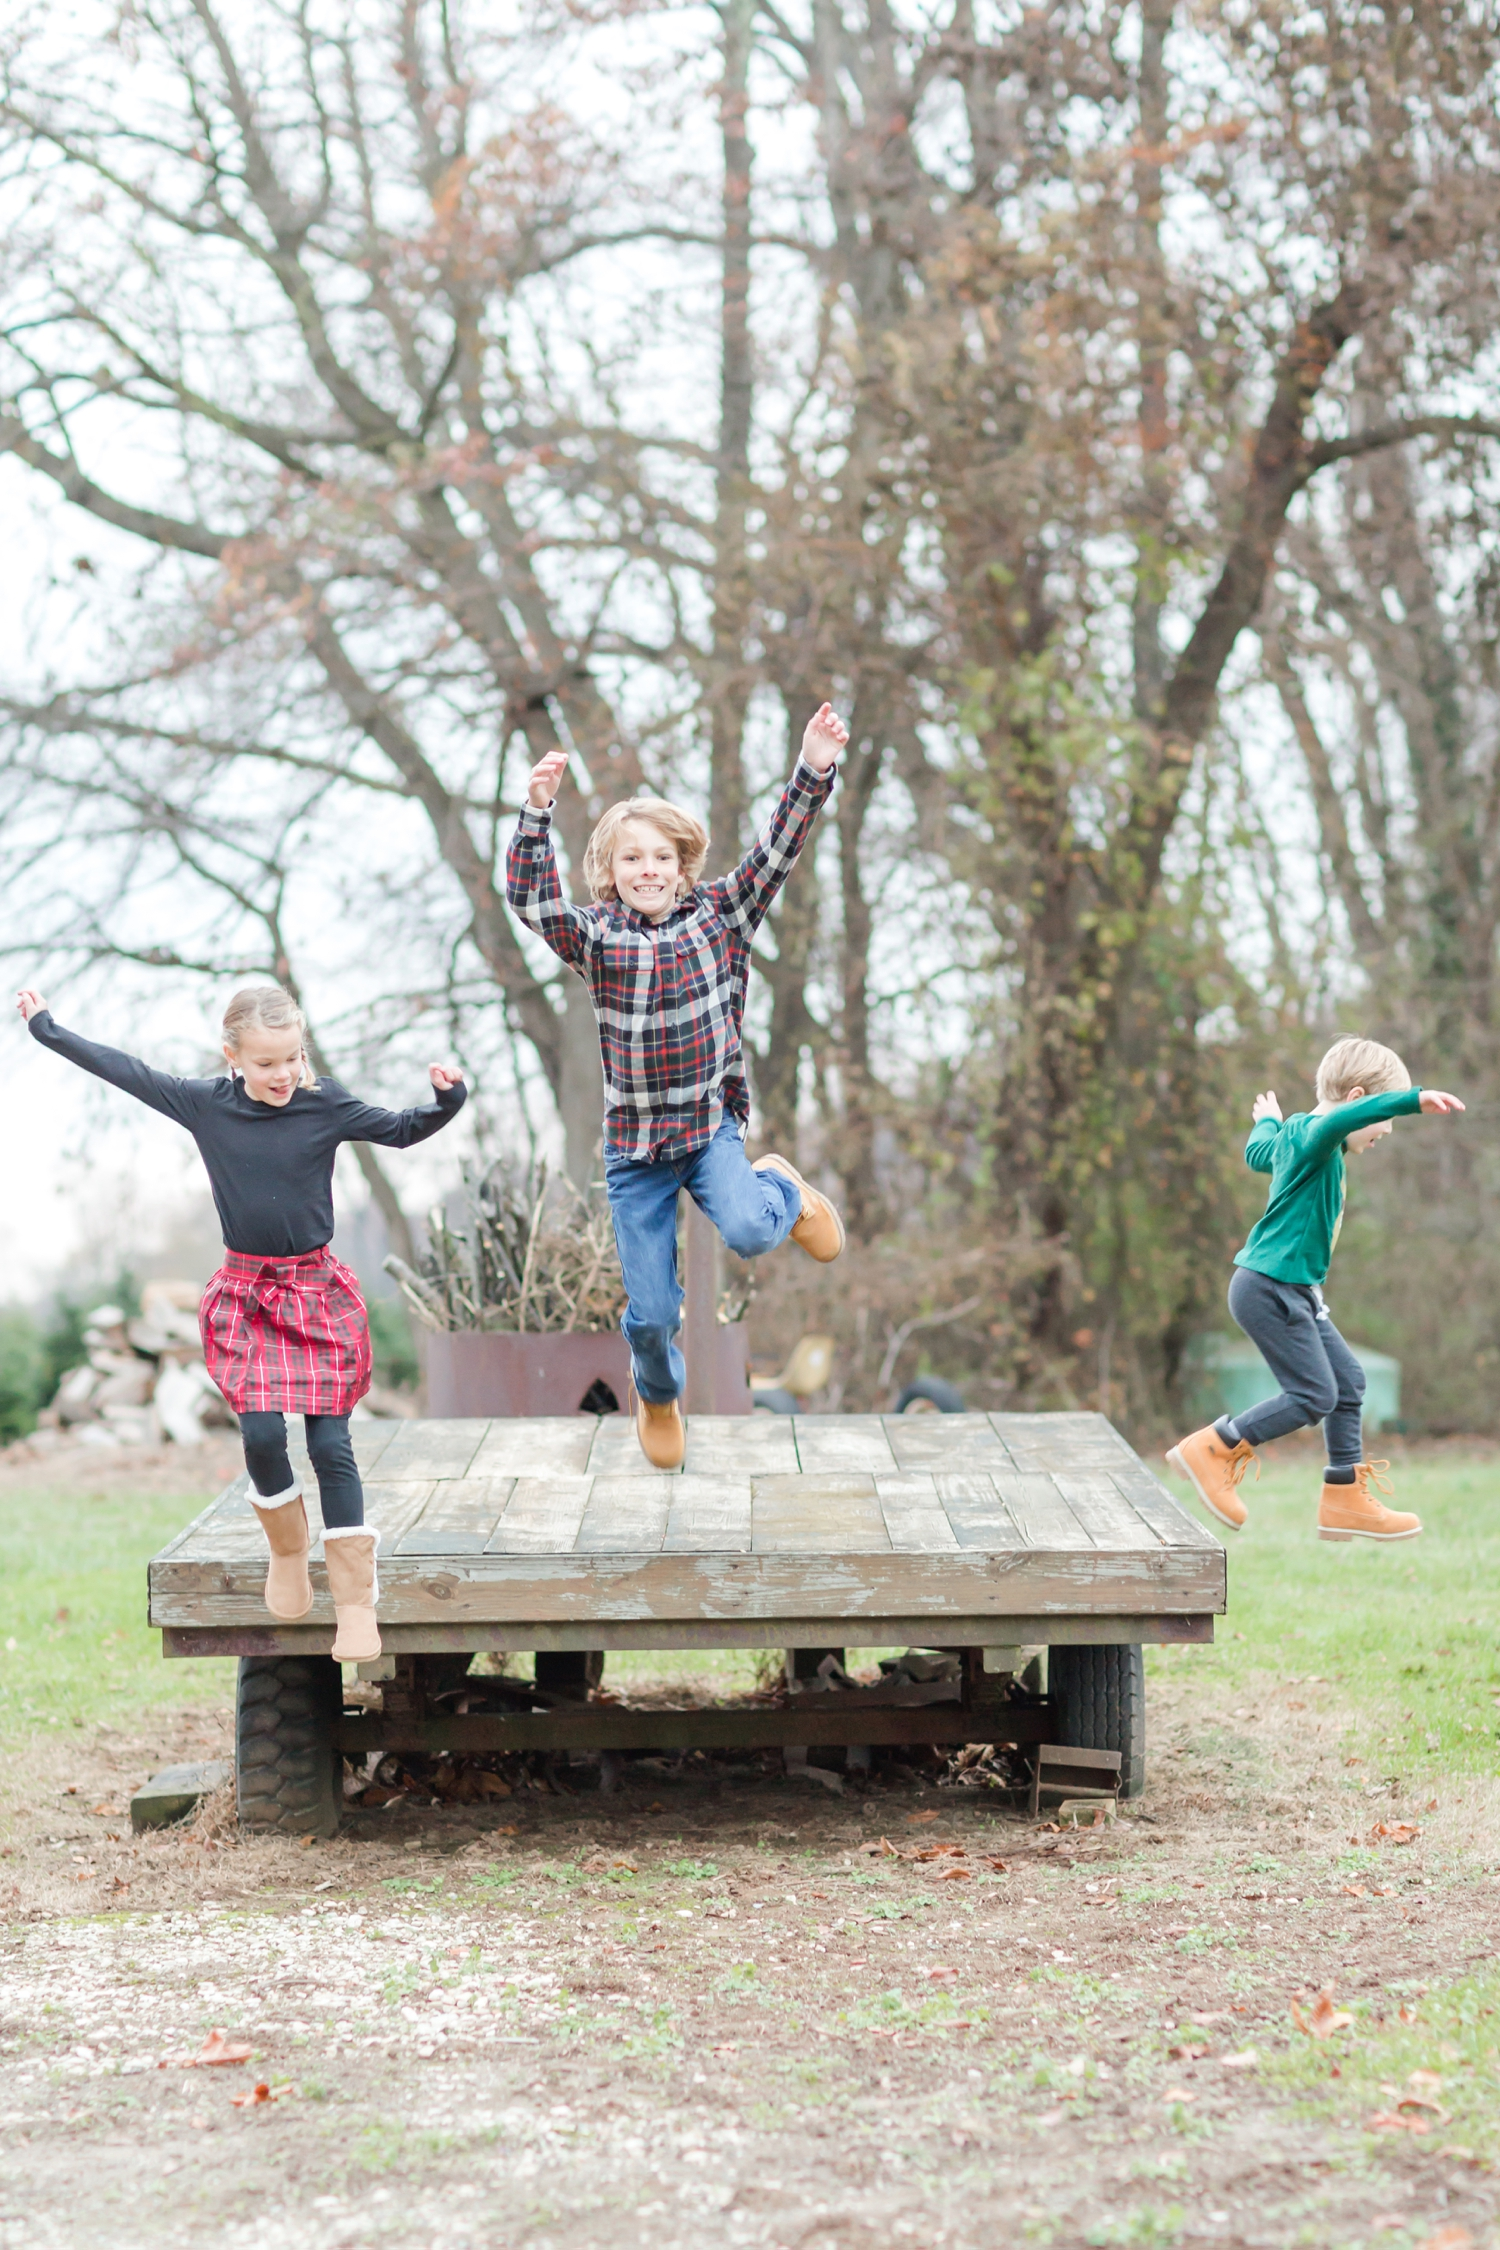 Golembiesky Family 2017-313_ruhl-tree-farm-baltimore-maryland-family-photography-anna-grace-photography-photo.jpg